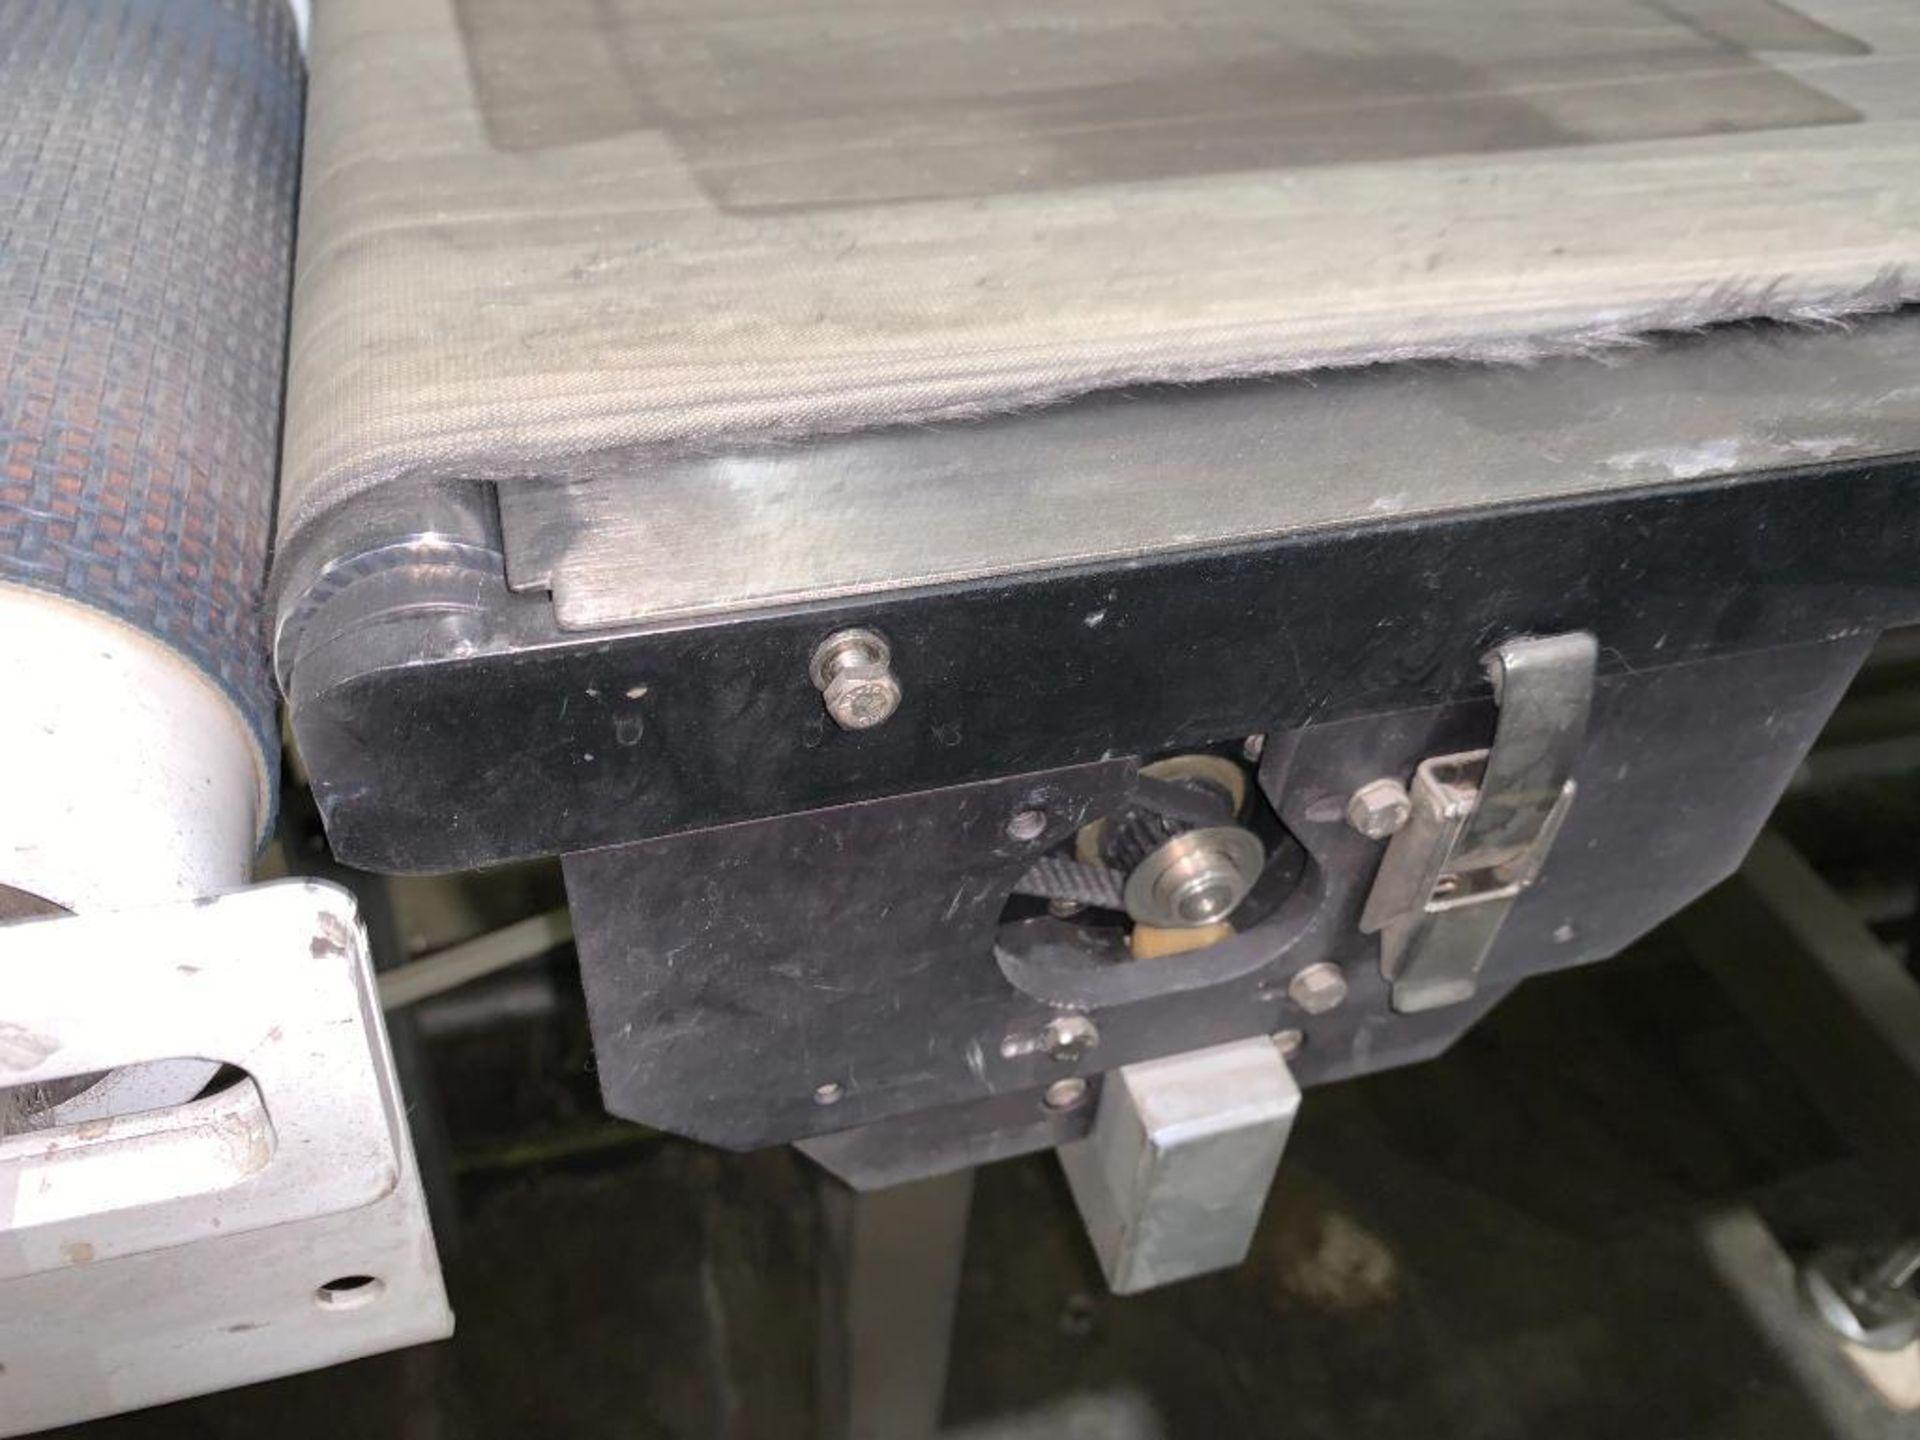 Mettler Toledo CombiChecker combination metal detector and checkweigher, model XE3 - Image 21 of 25